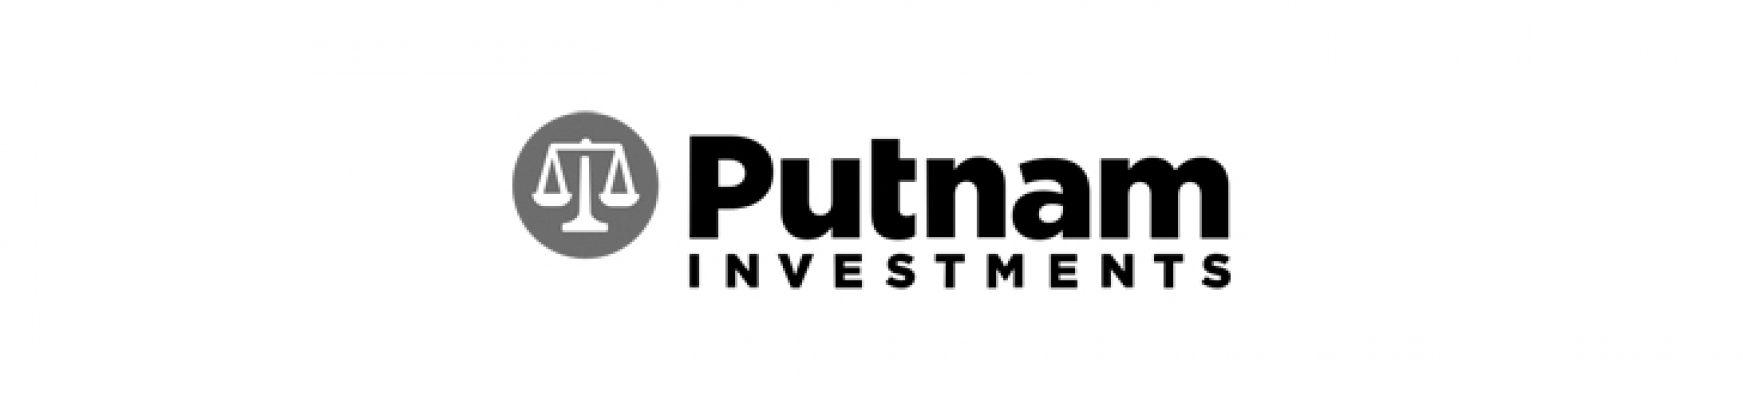 Putnam-Investments-Logo